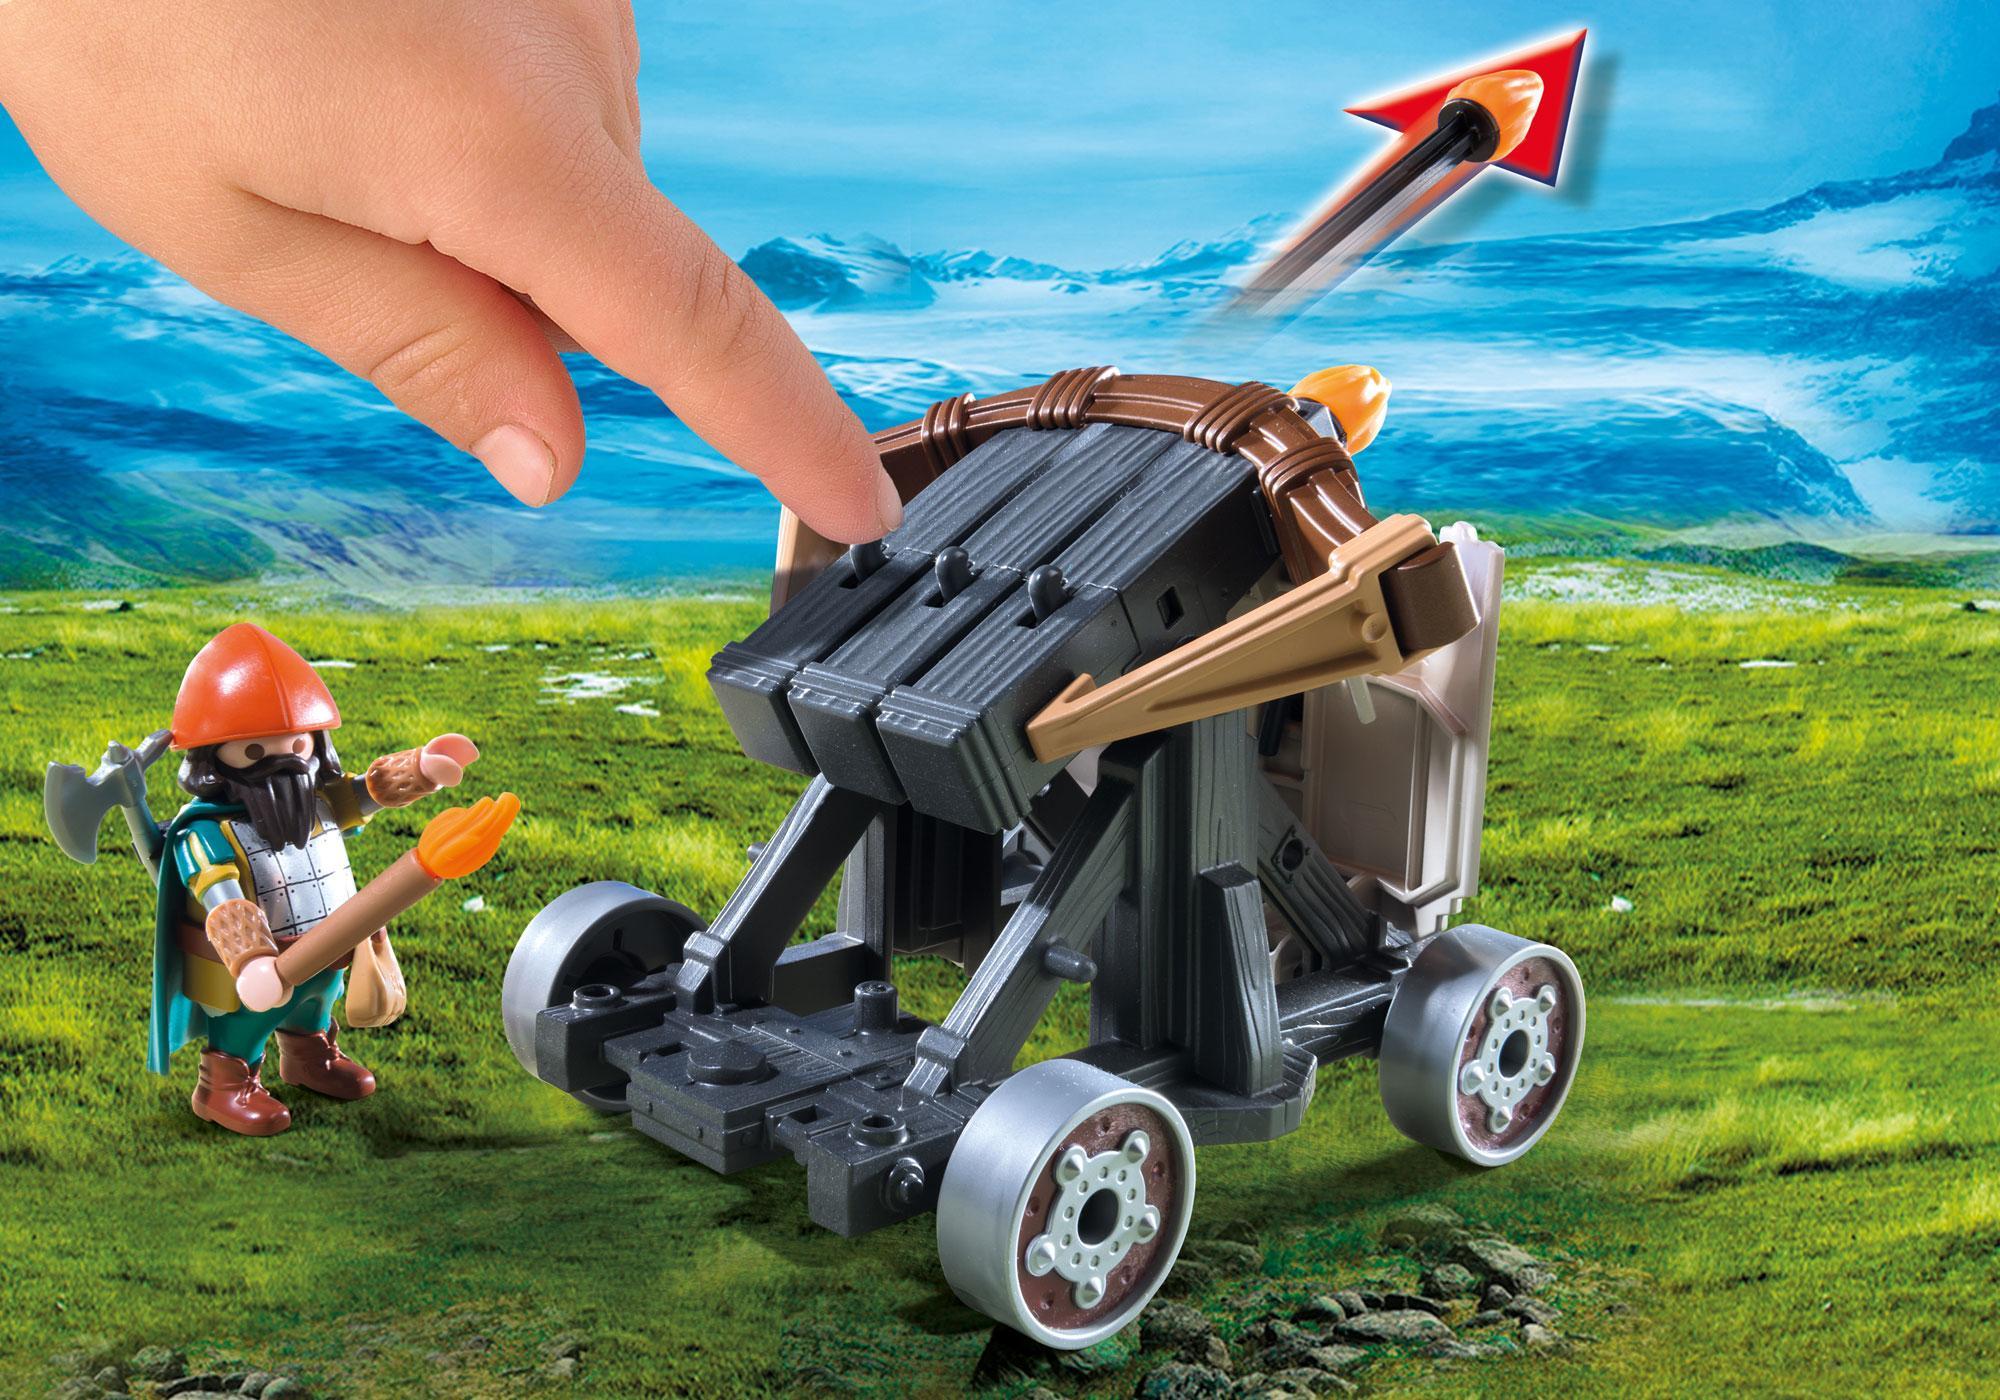 http://media.playmobil.com/i/playmobil/9341_product_extra2/Squadra d'assalto con balestra